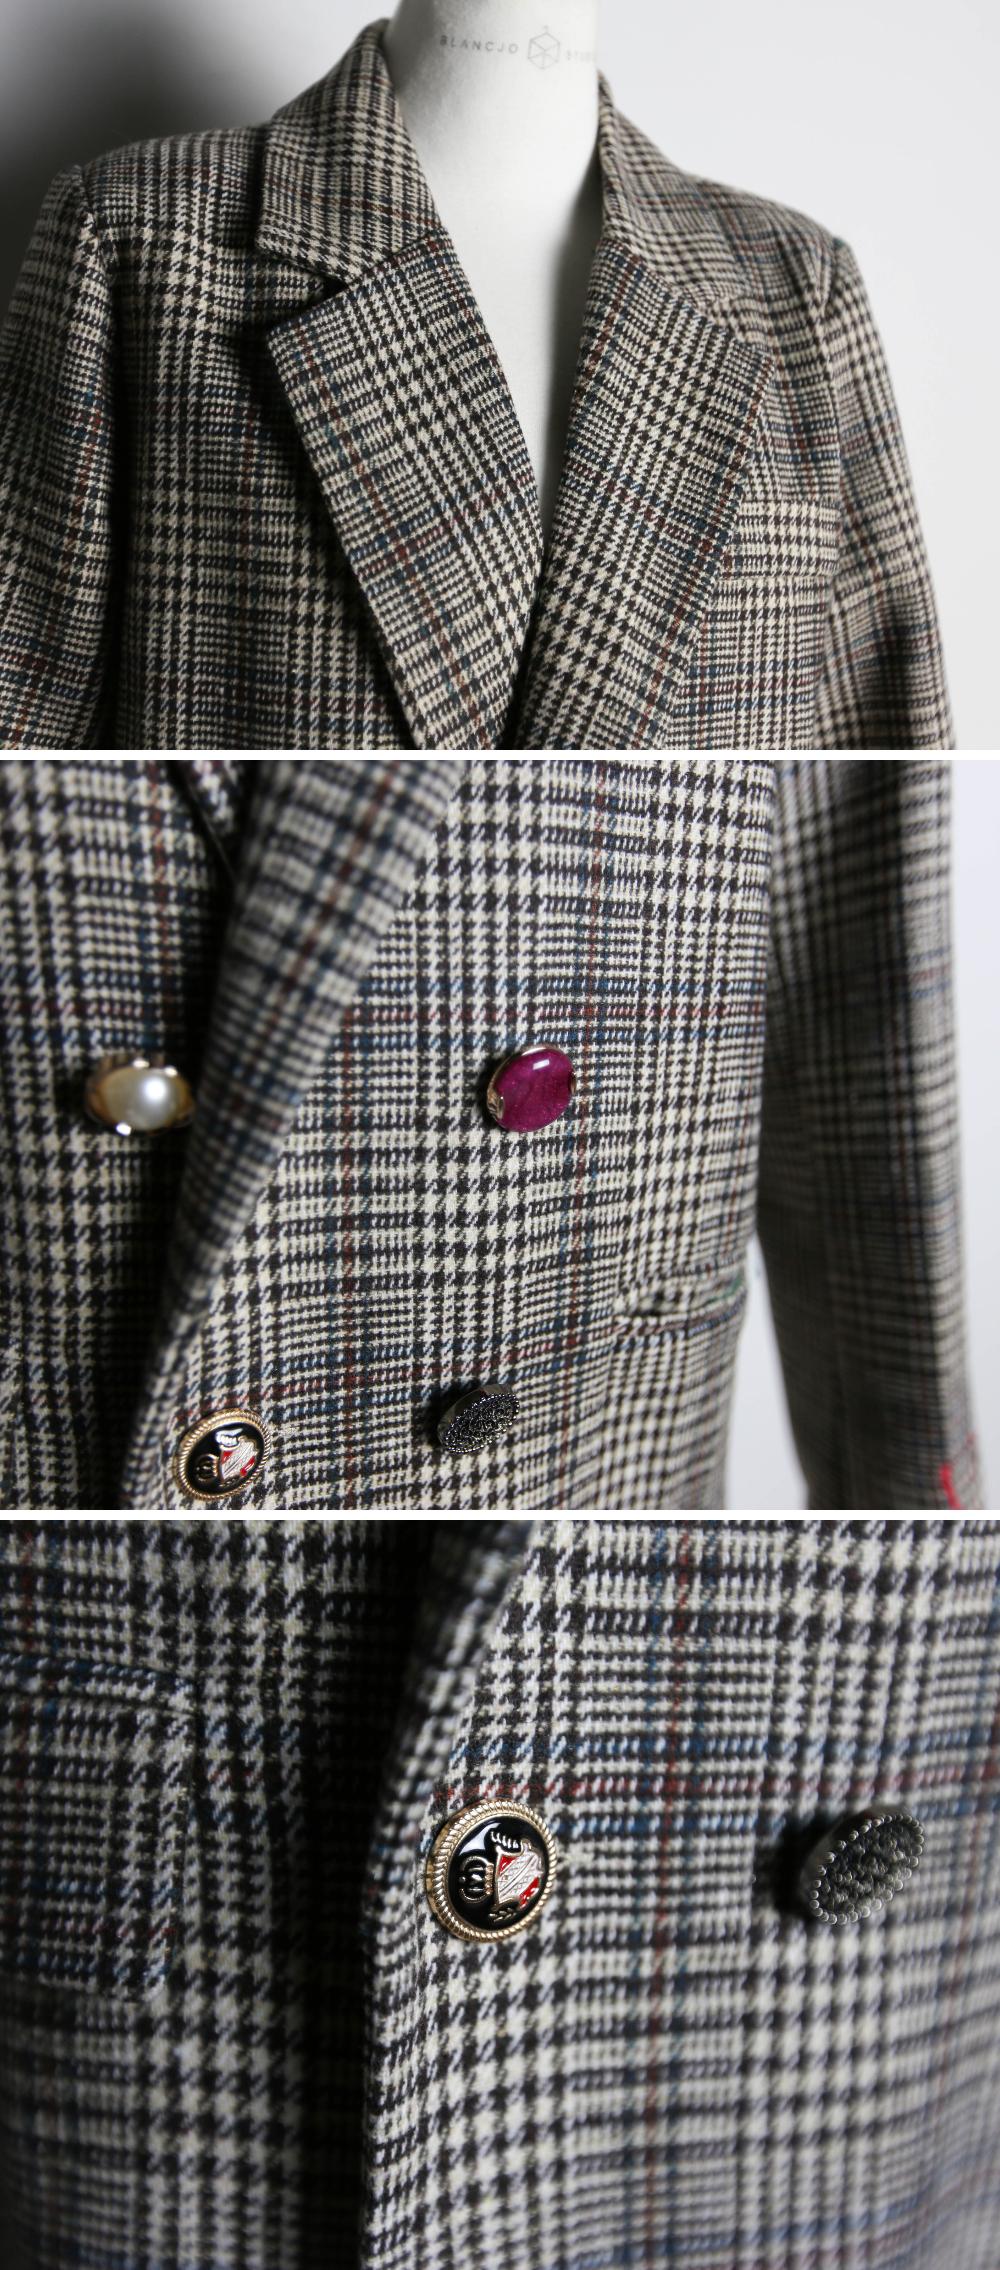 Glen retro embroidery blazer_jk03471